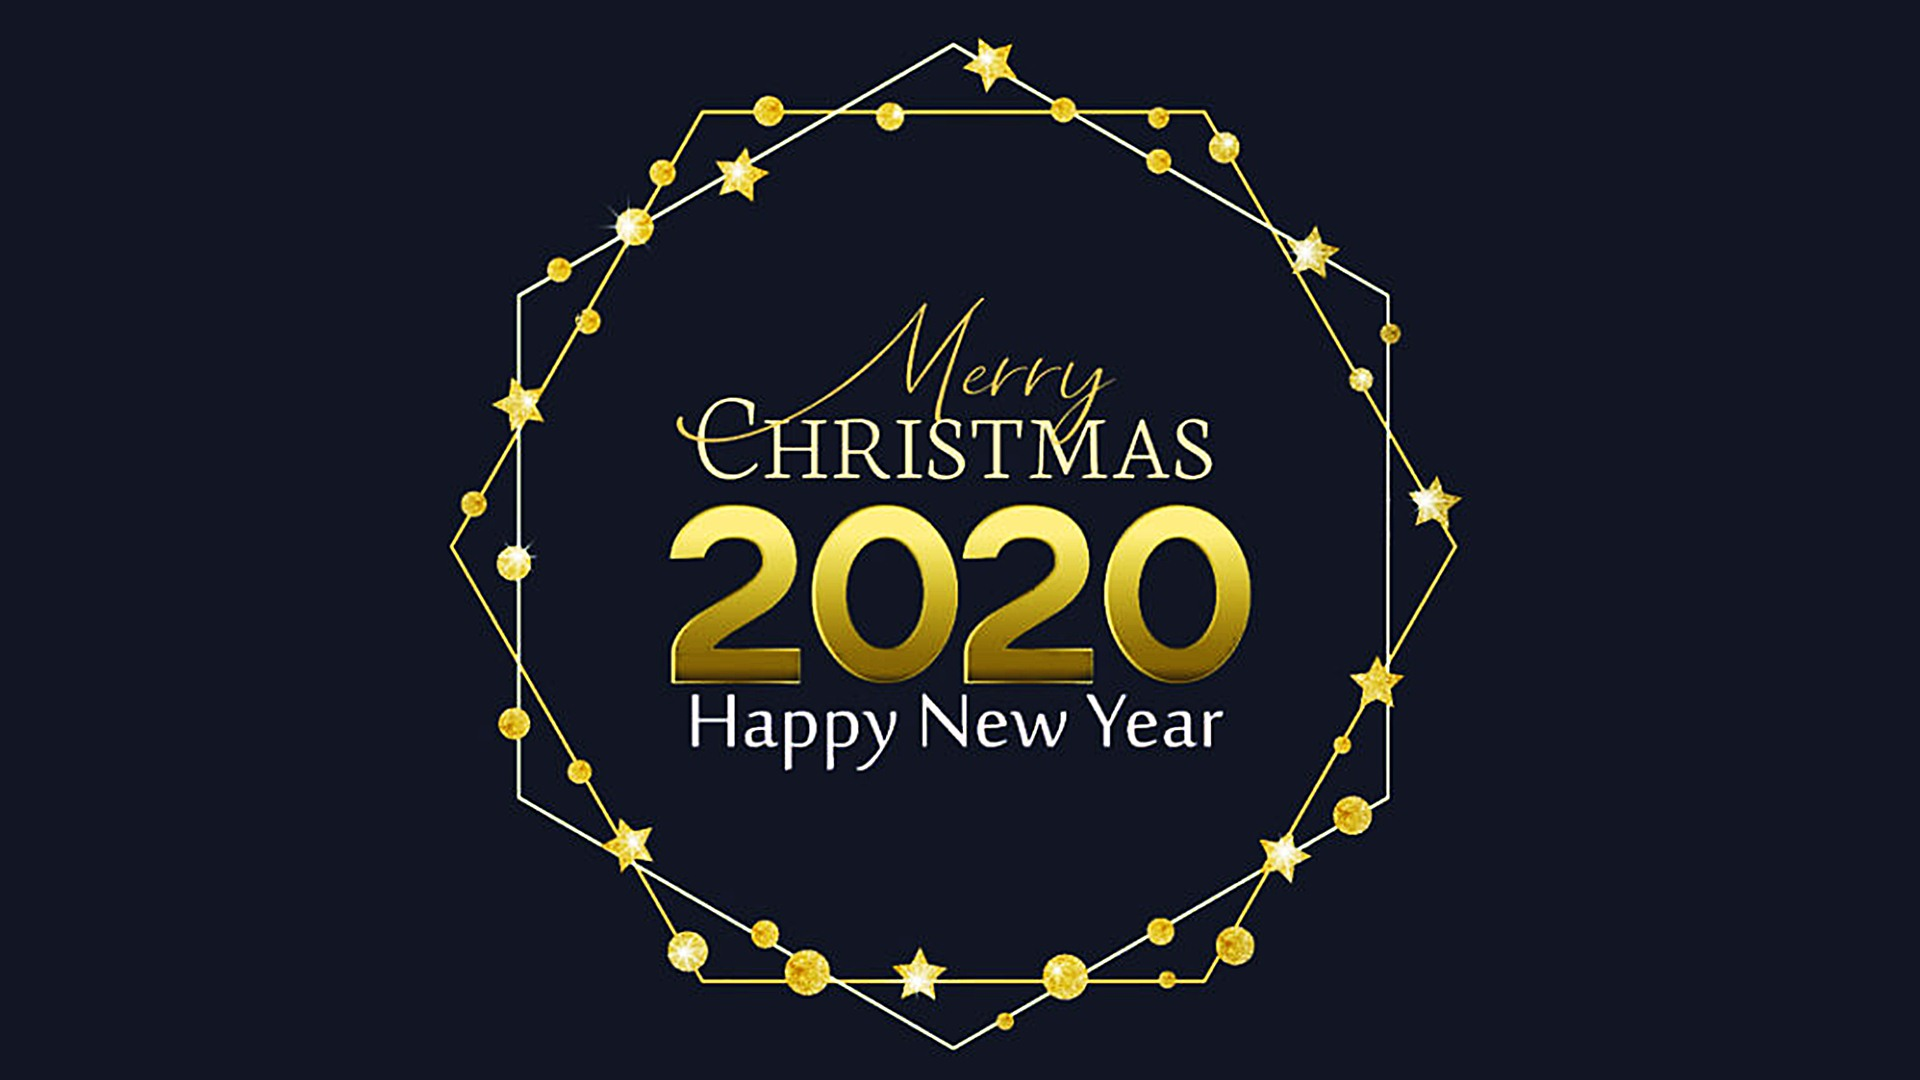 Happy New Year 2020 HD Background Wallpaper 45548   Baltana 1920x1080